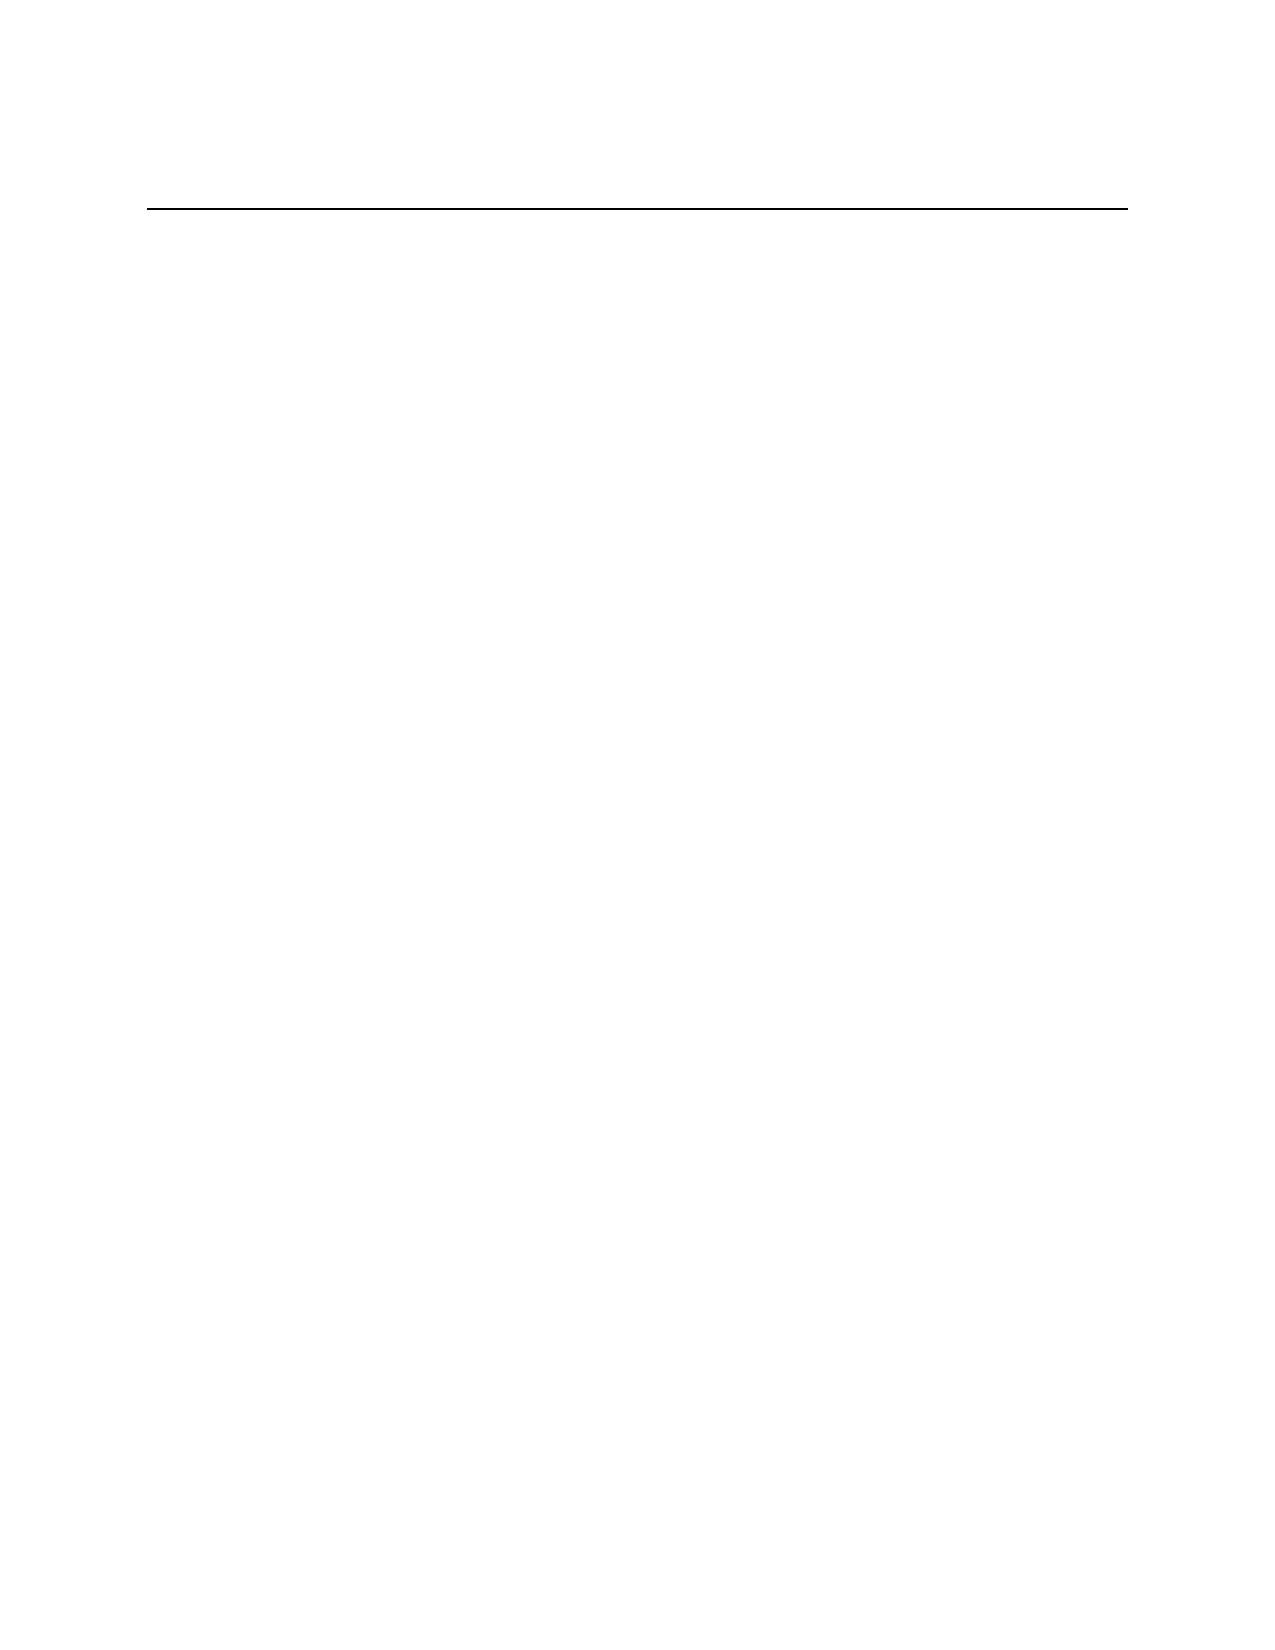 D102GGC2 pdf